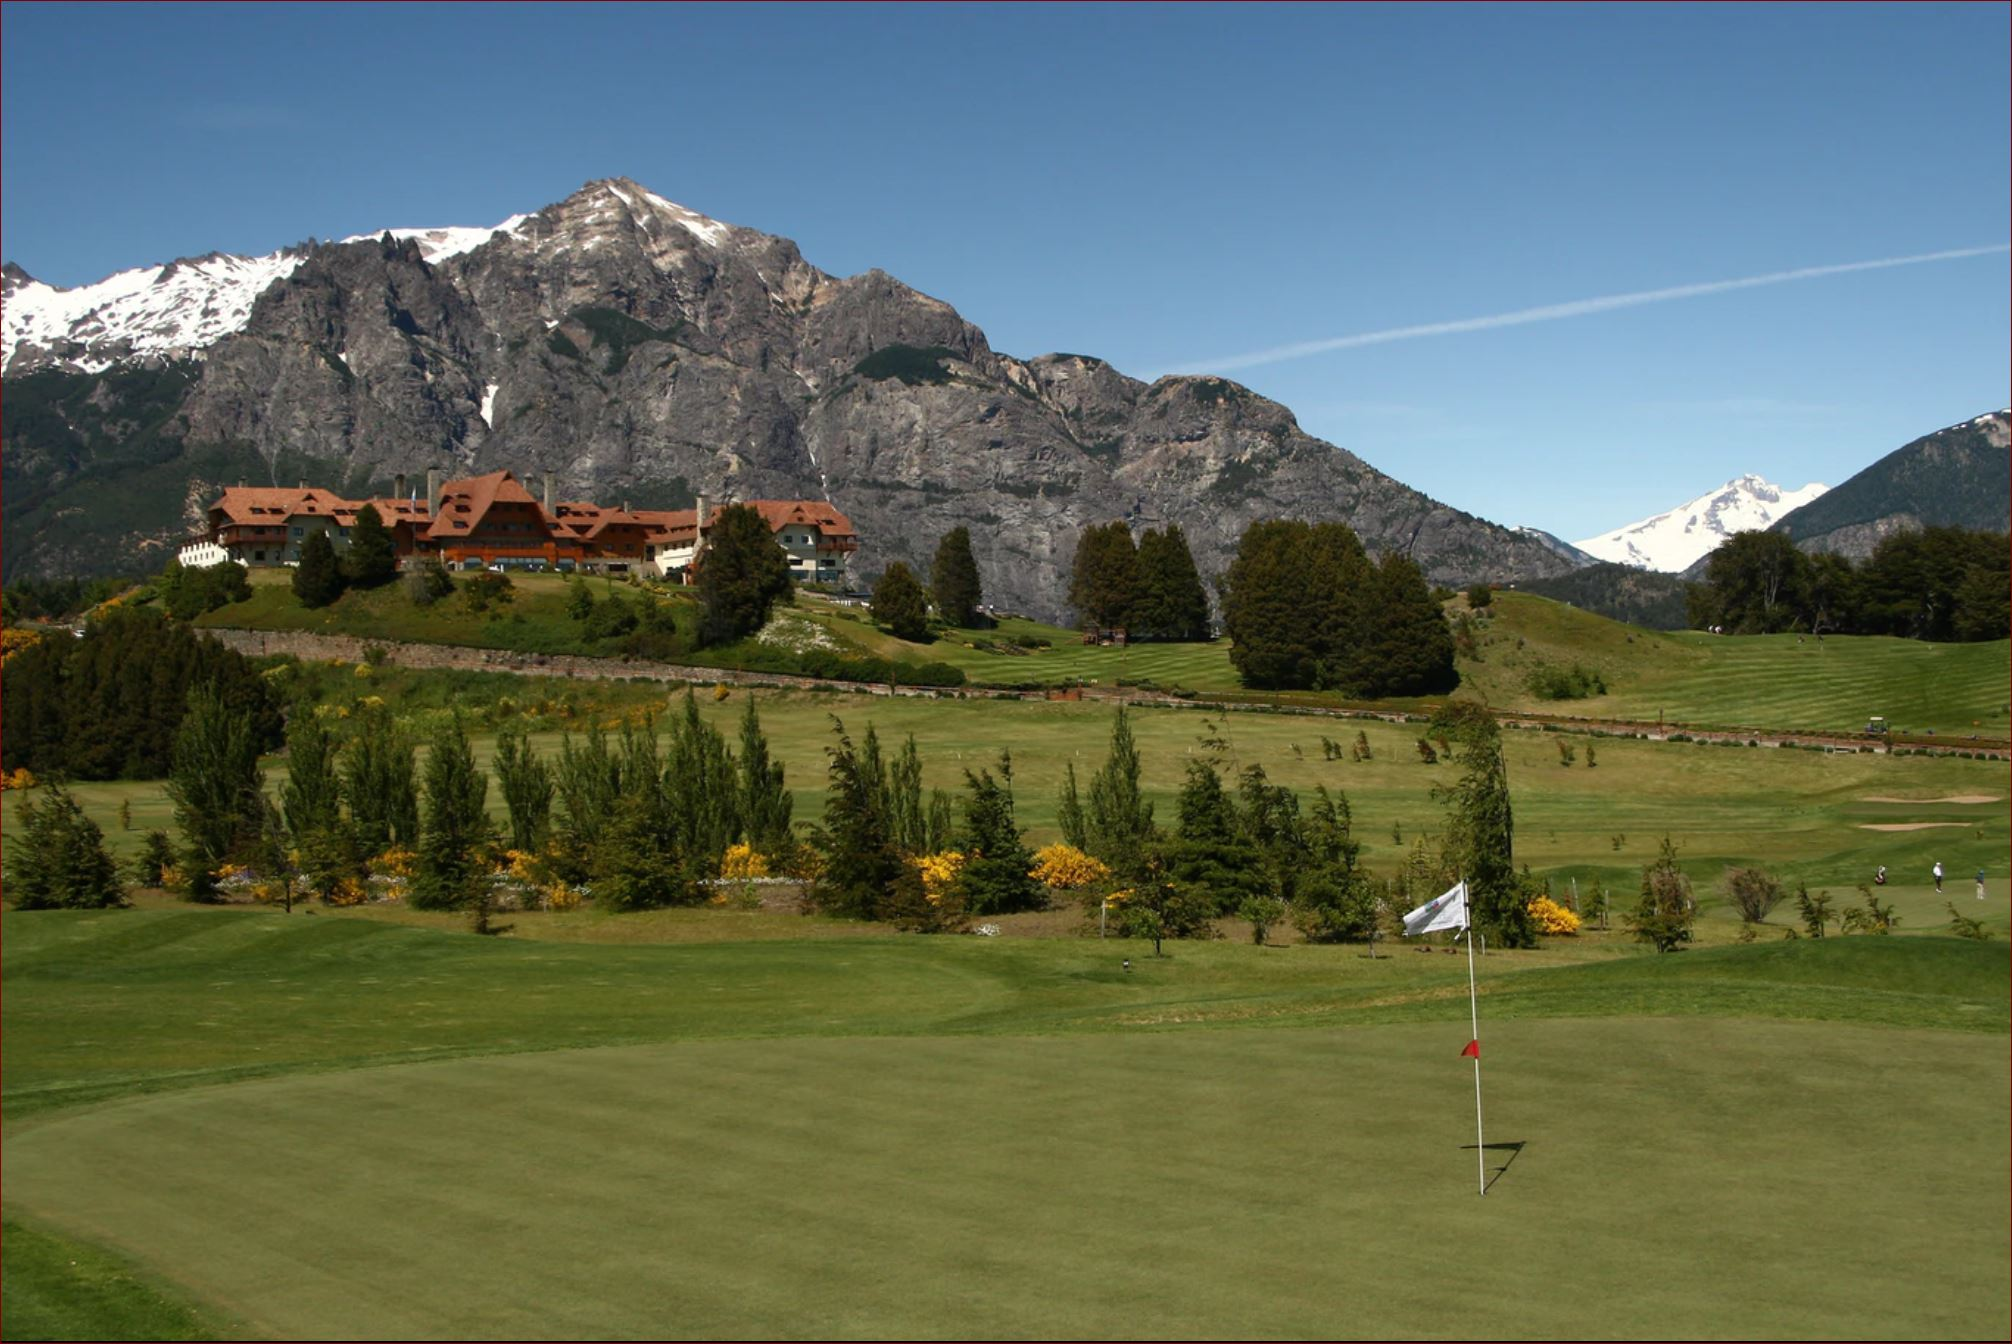 Llao Llao Resort, Golf - Spa on SelfishMe Travel